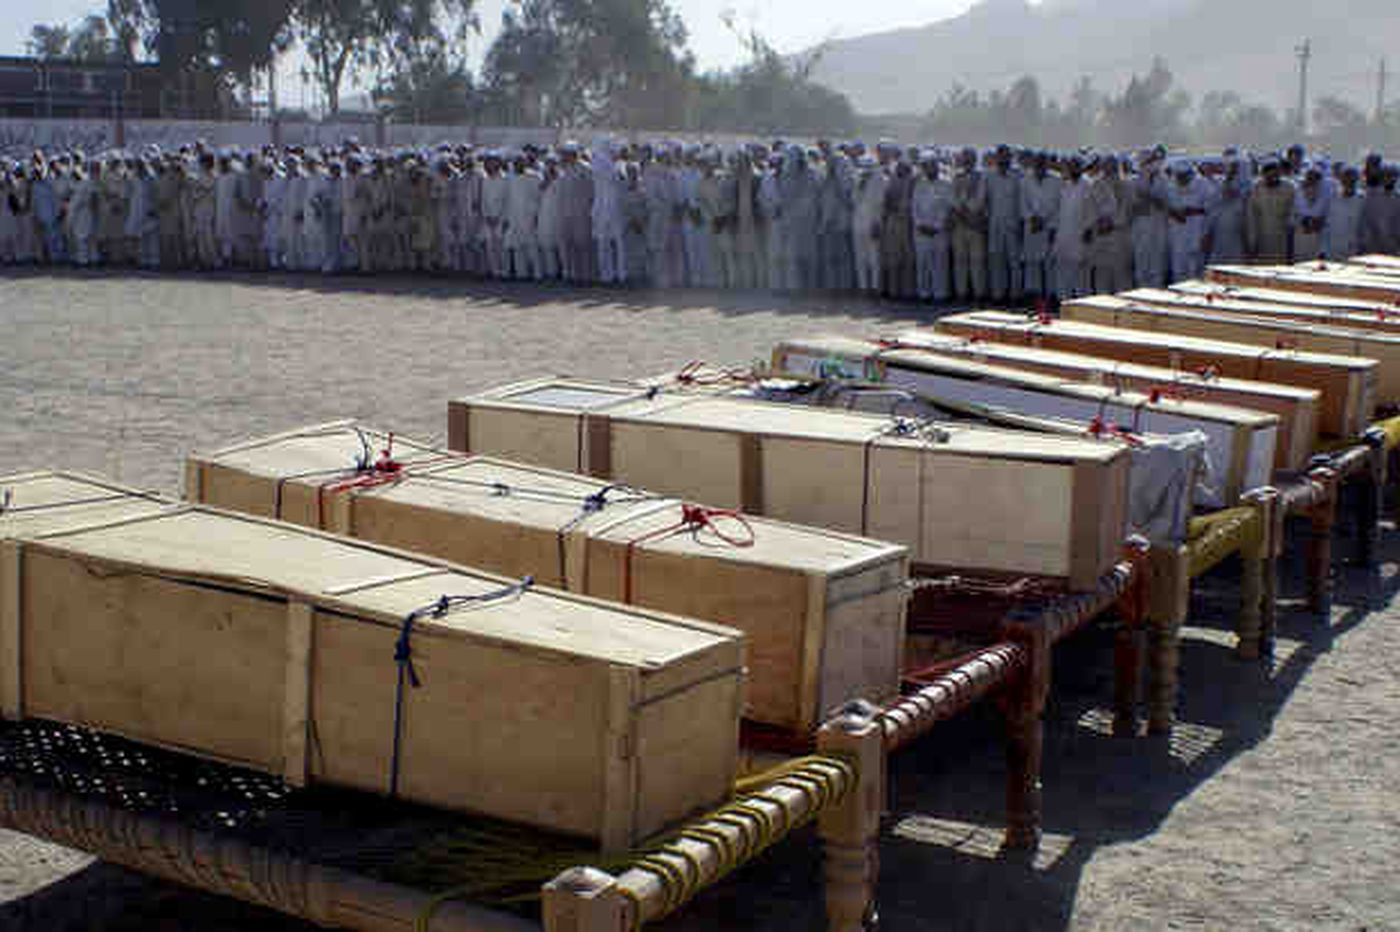 NATO tankers bombed in Pakistan; 15 die